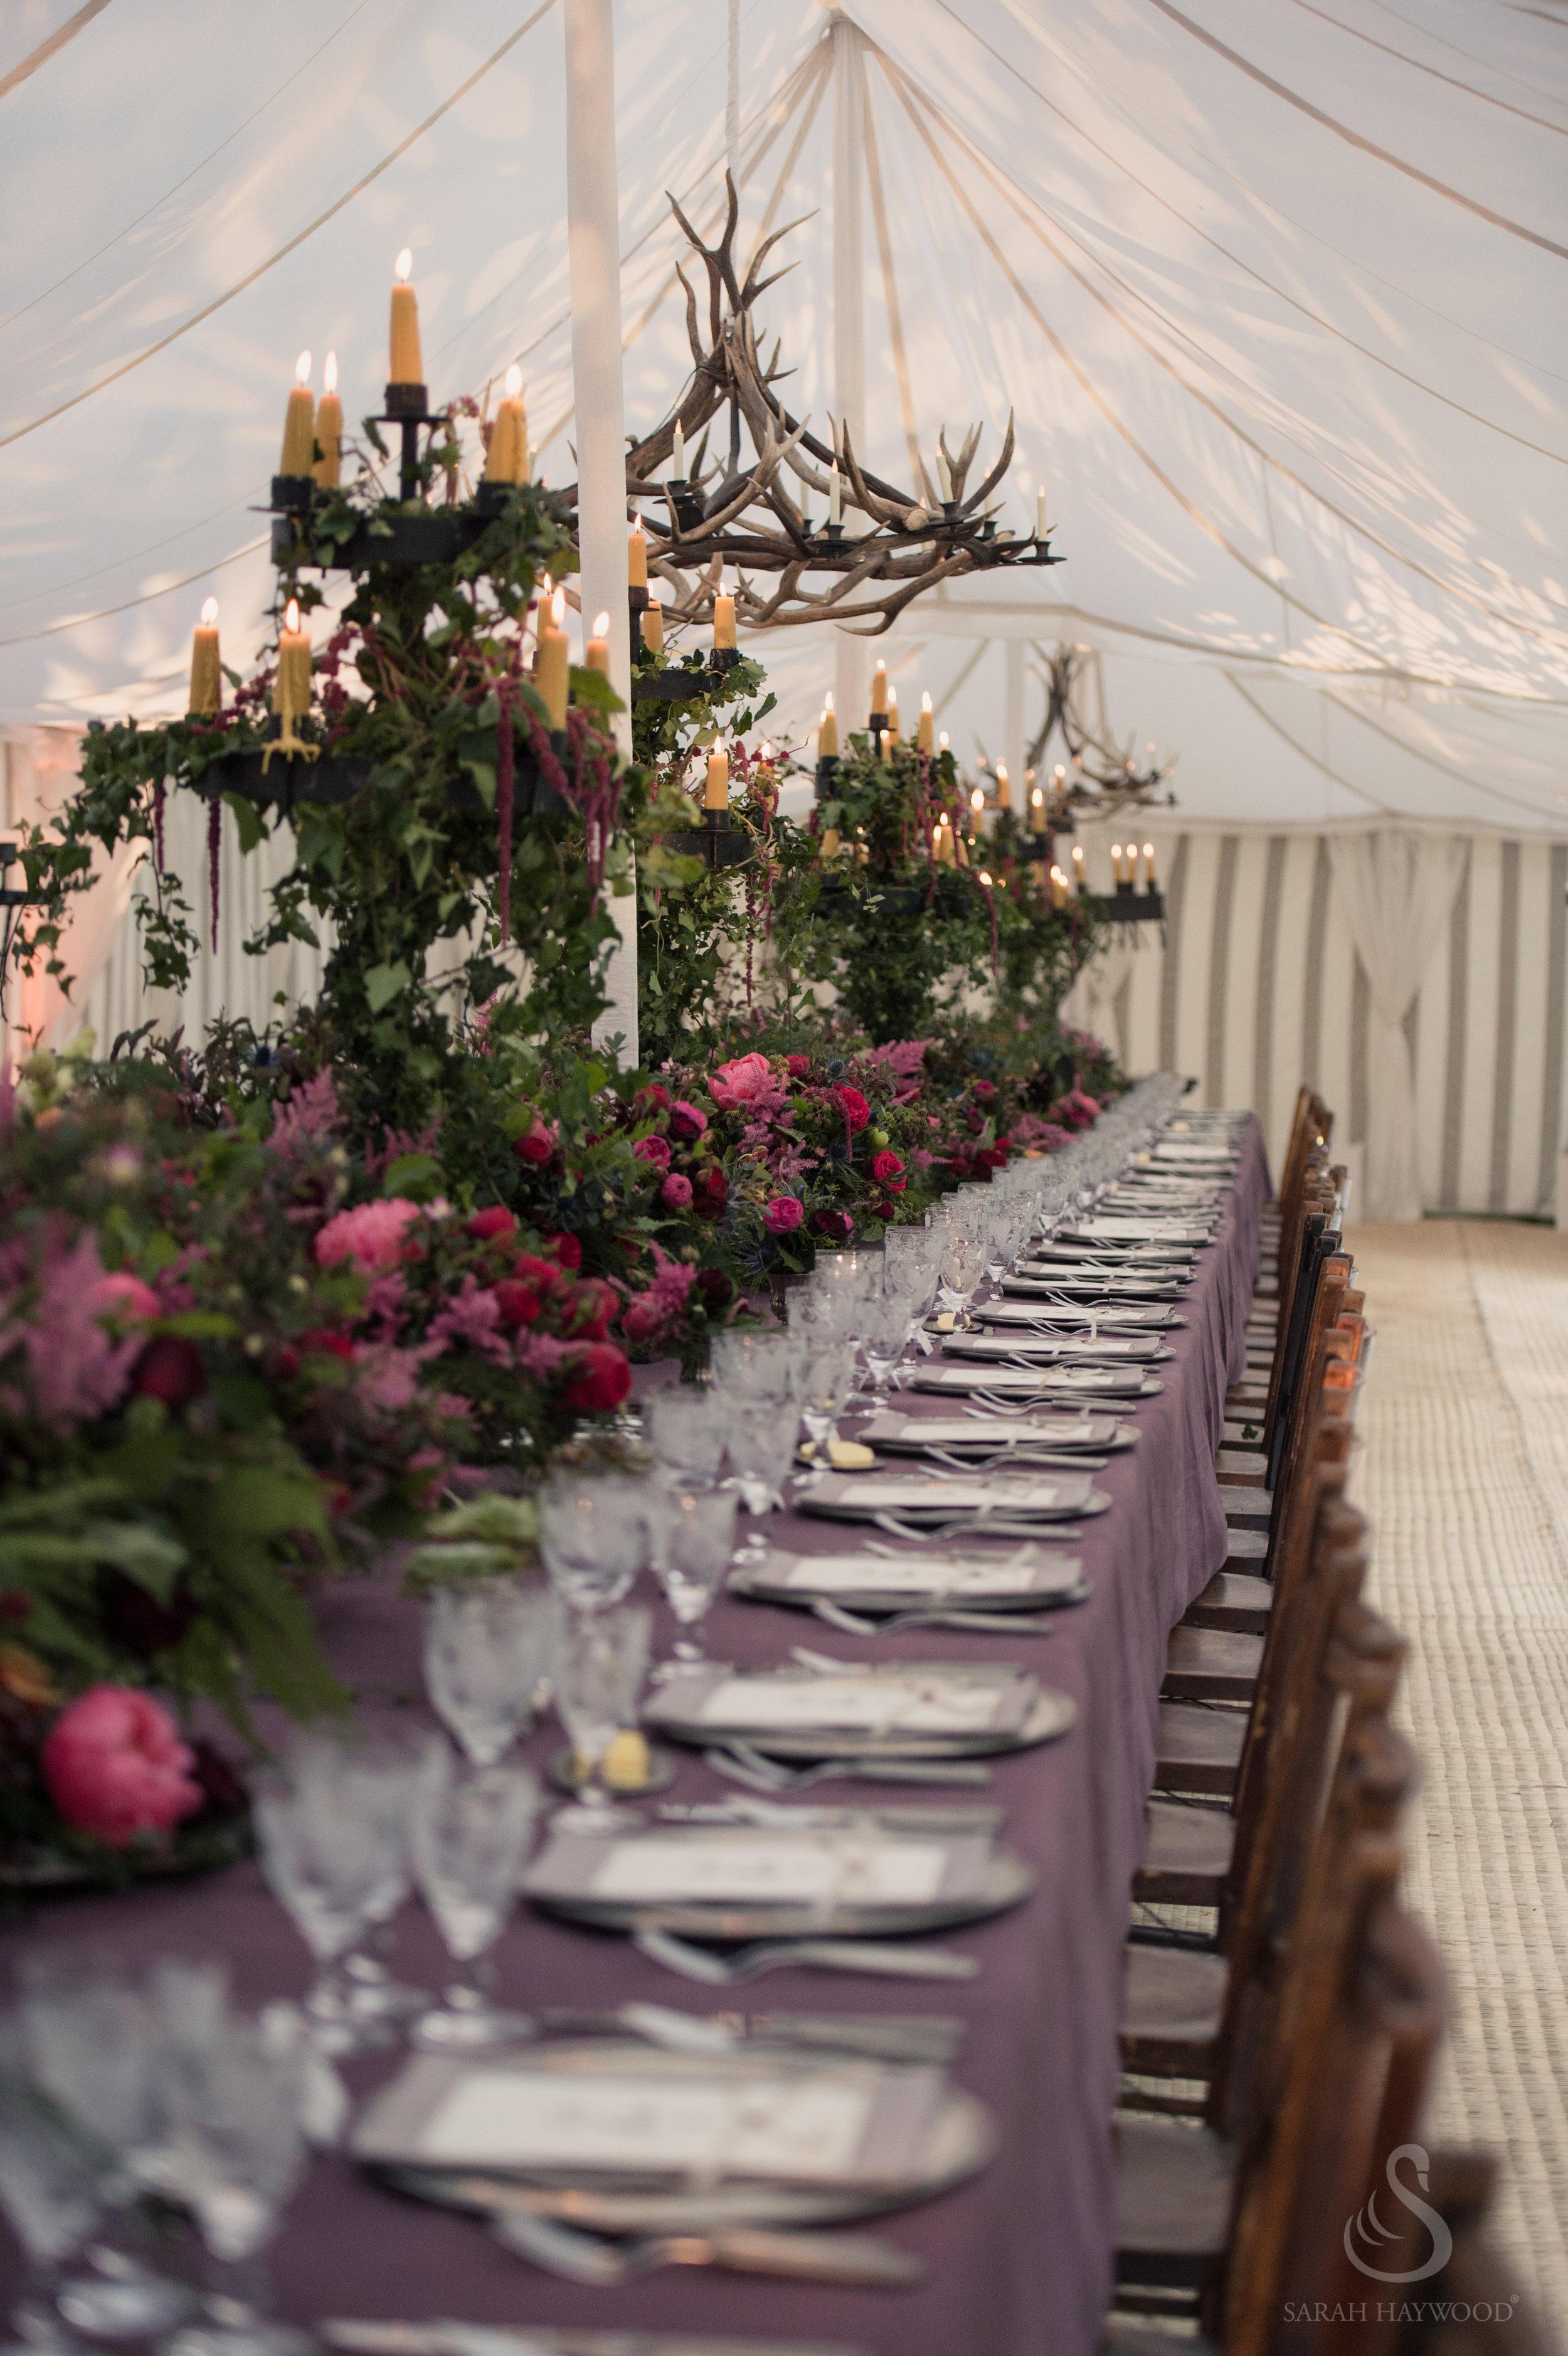 Scotland_Wedding_copyright_Carla Ten Eyck_for Sarah Haywood Wedding Design_941 copy.jpg